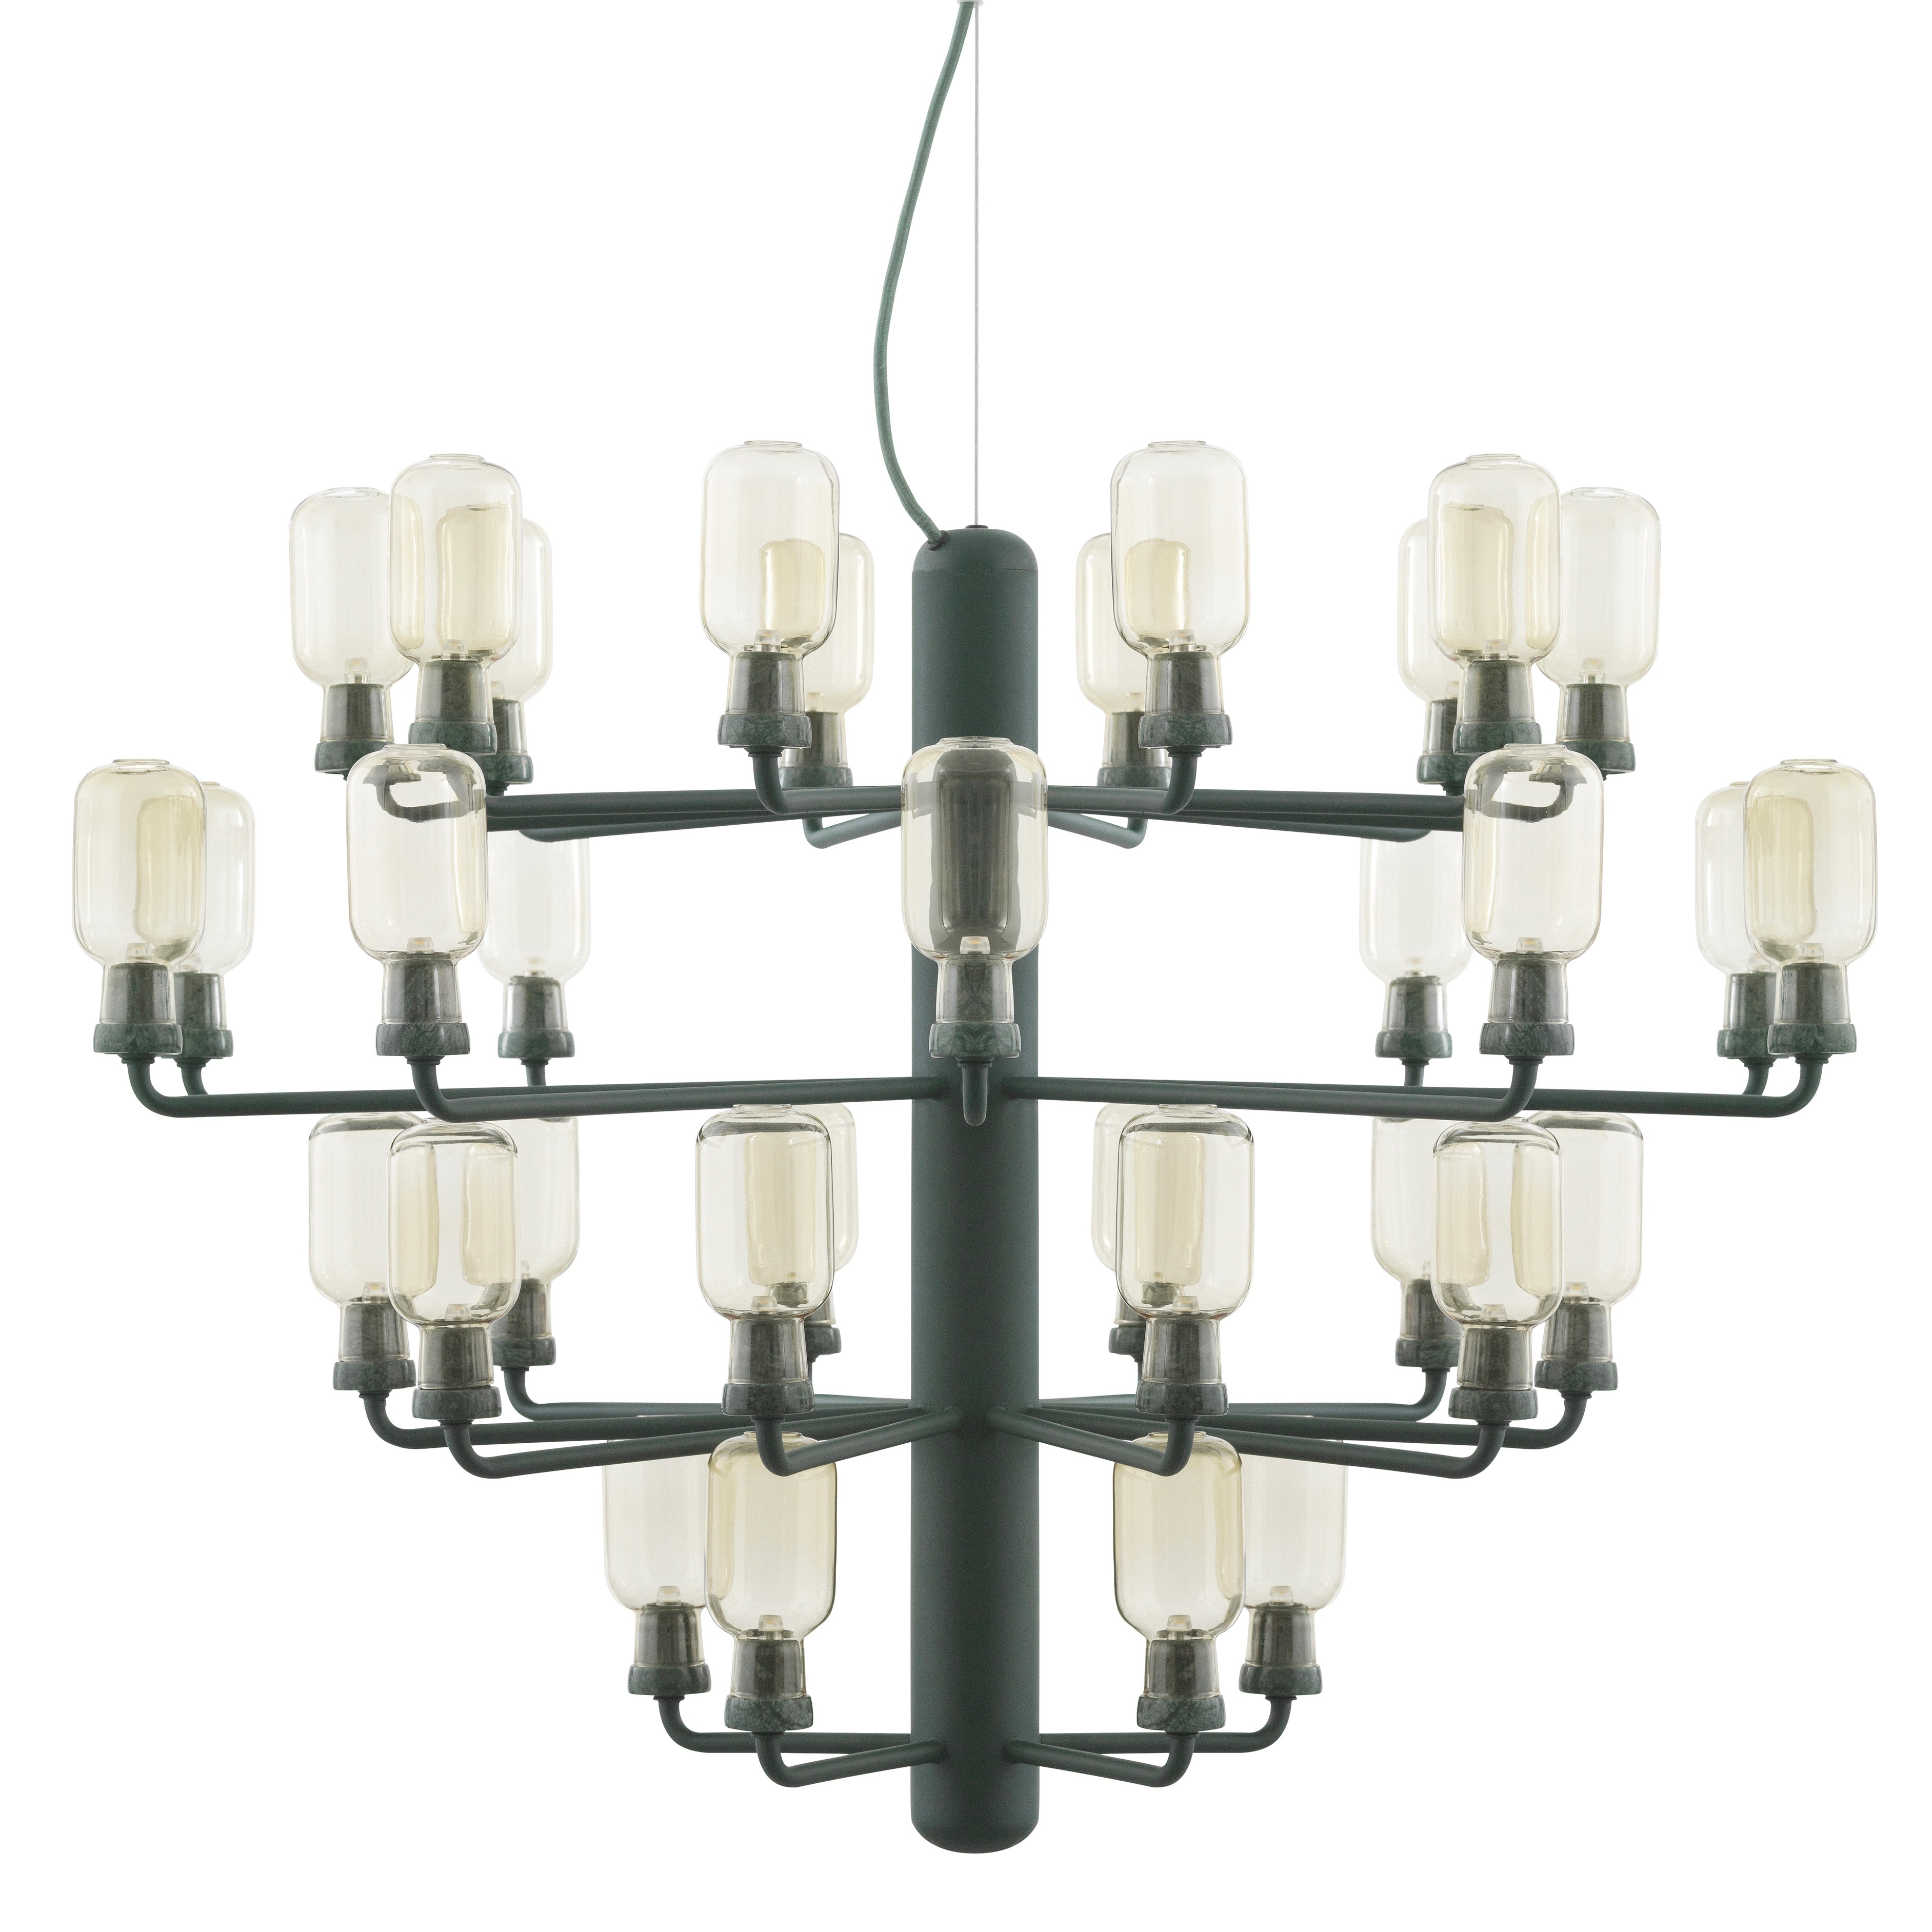 Amp chandelier L gold/green